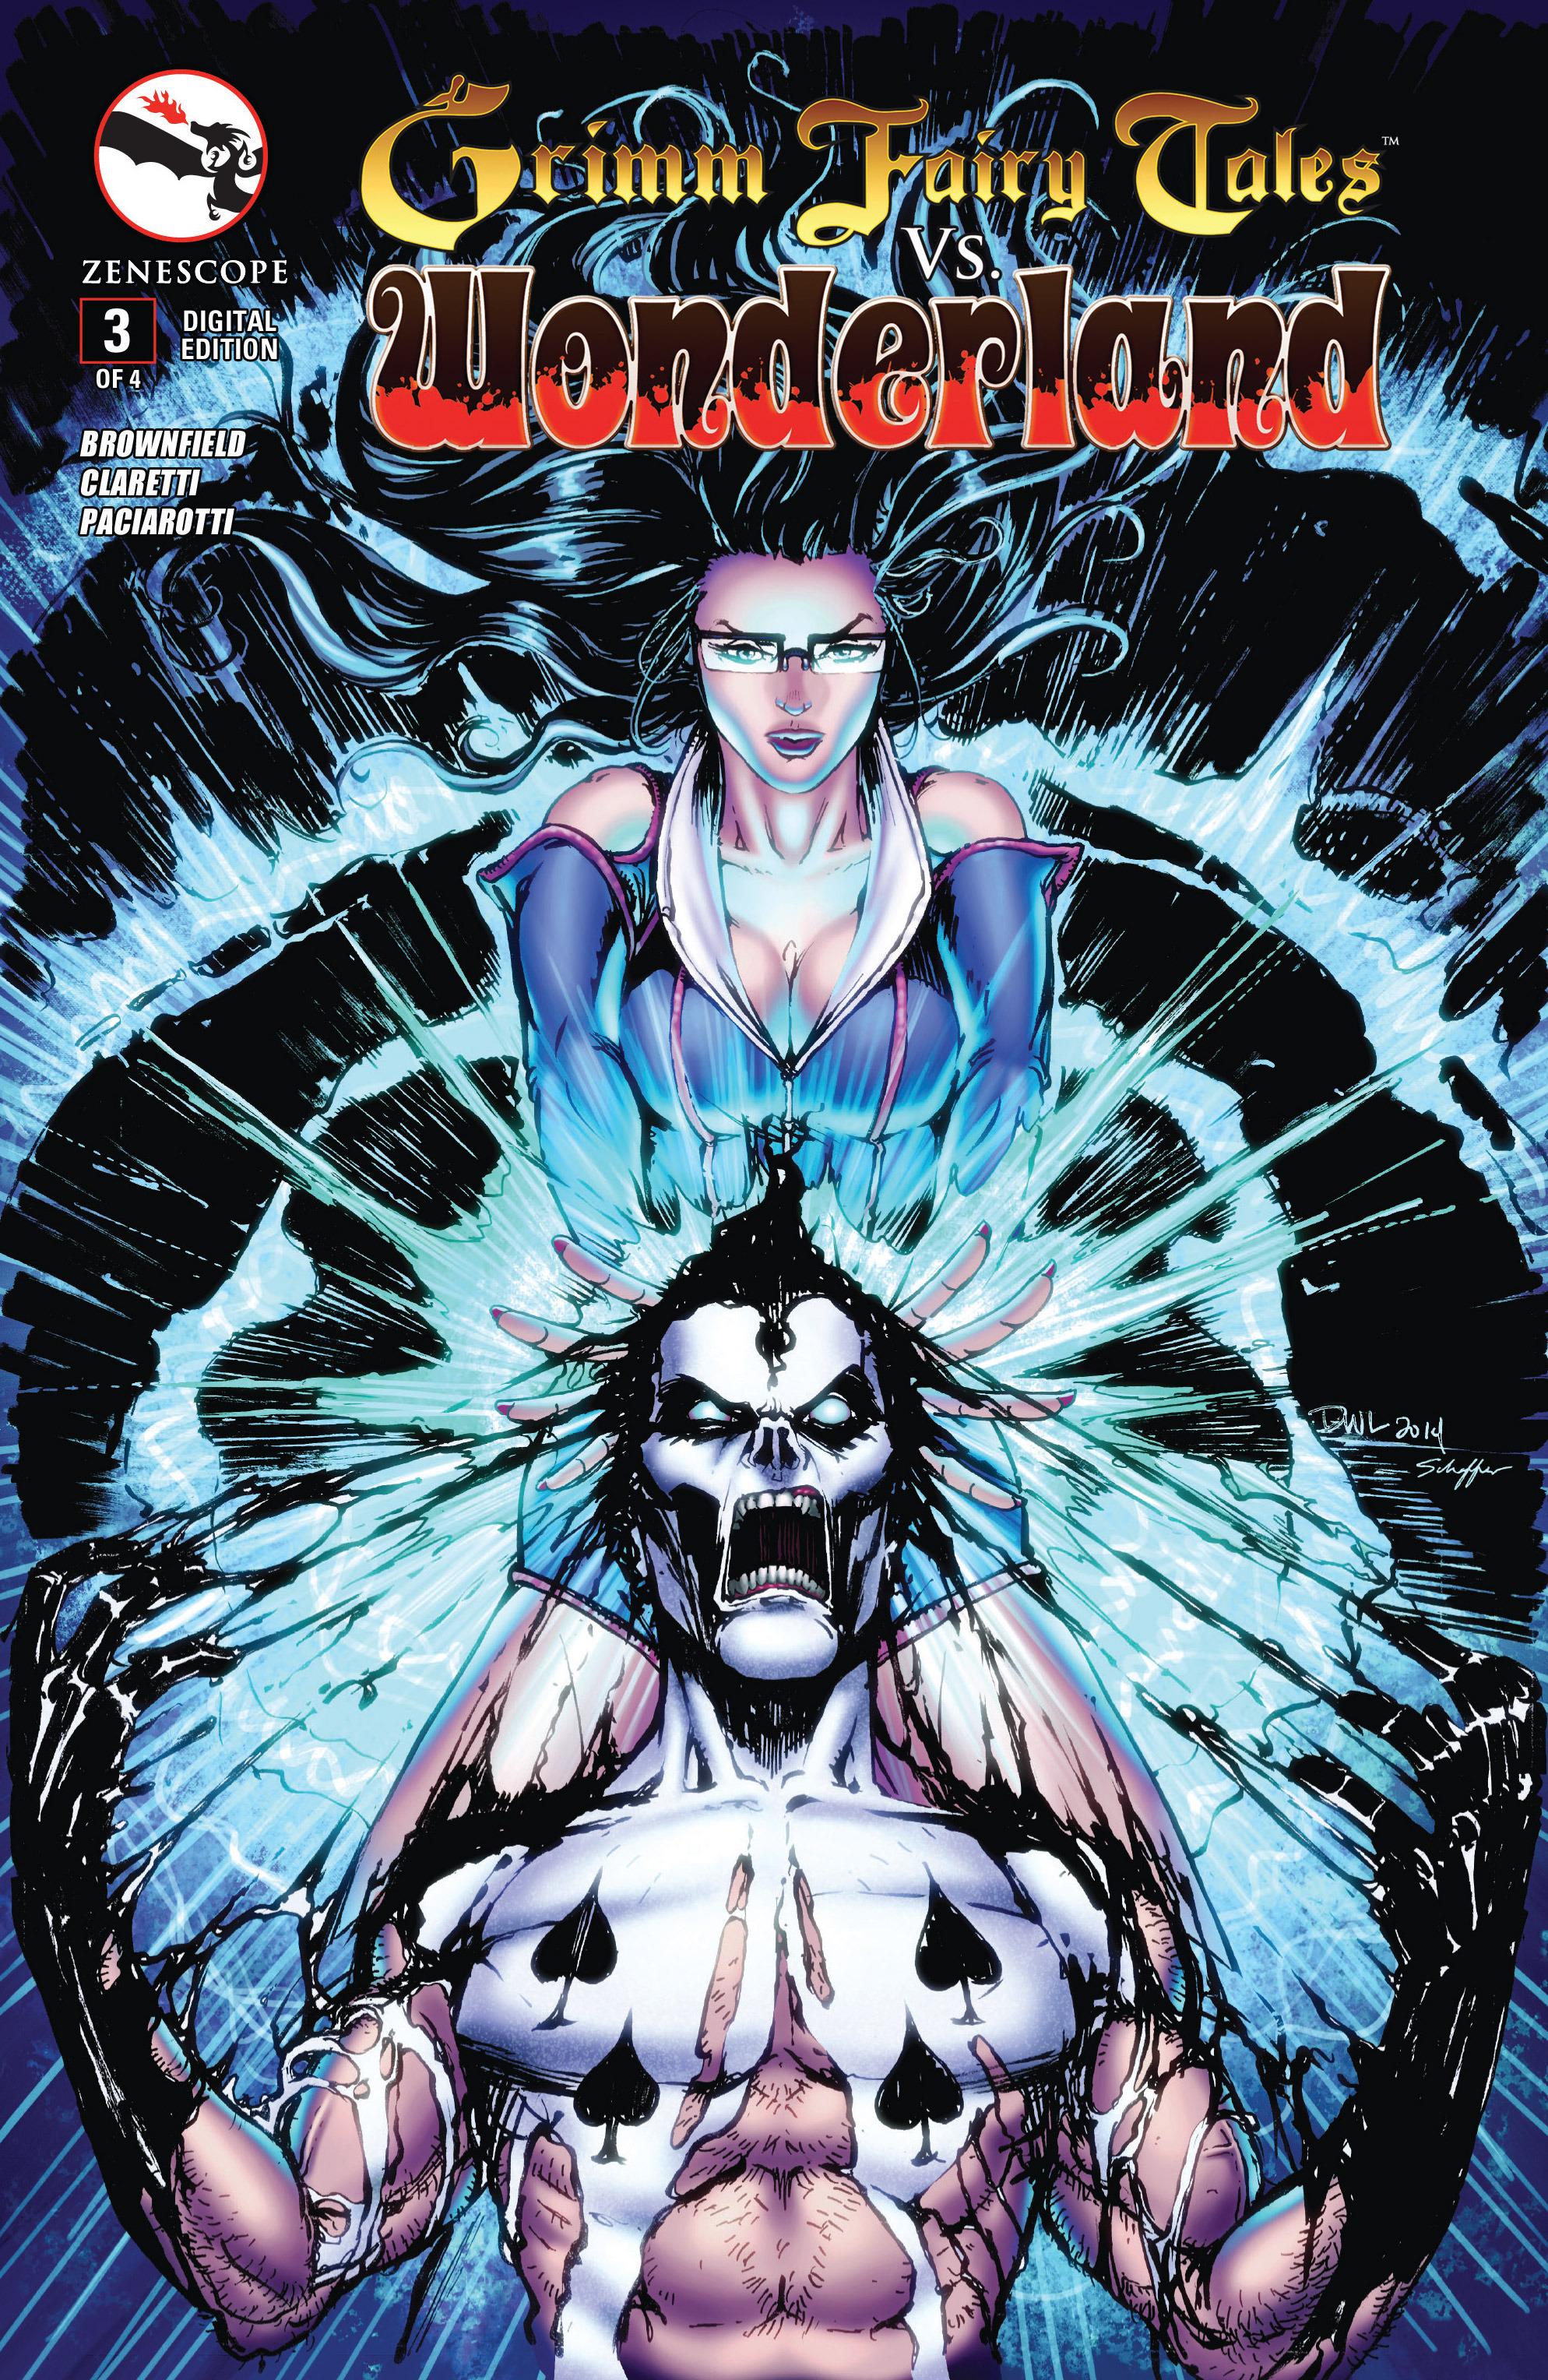 Read online Grimm Fairy Tales vs. Wonderland comic -  Issue #3 - 1